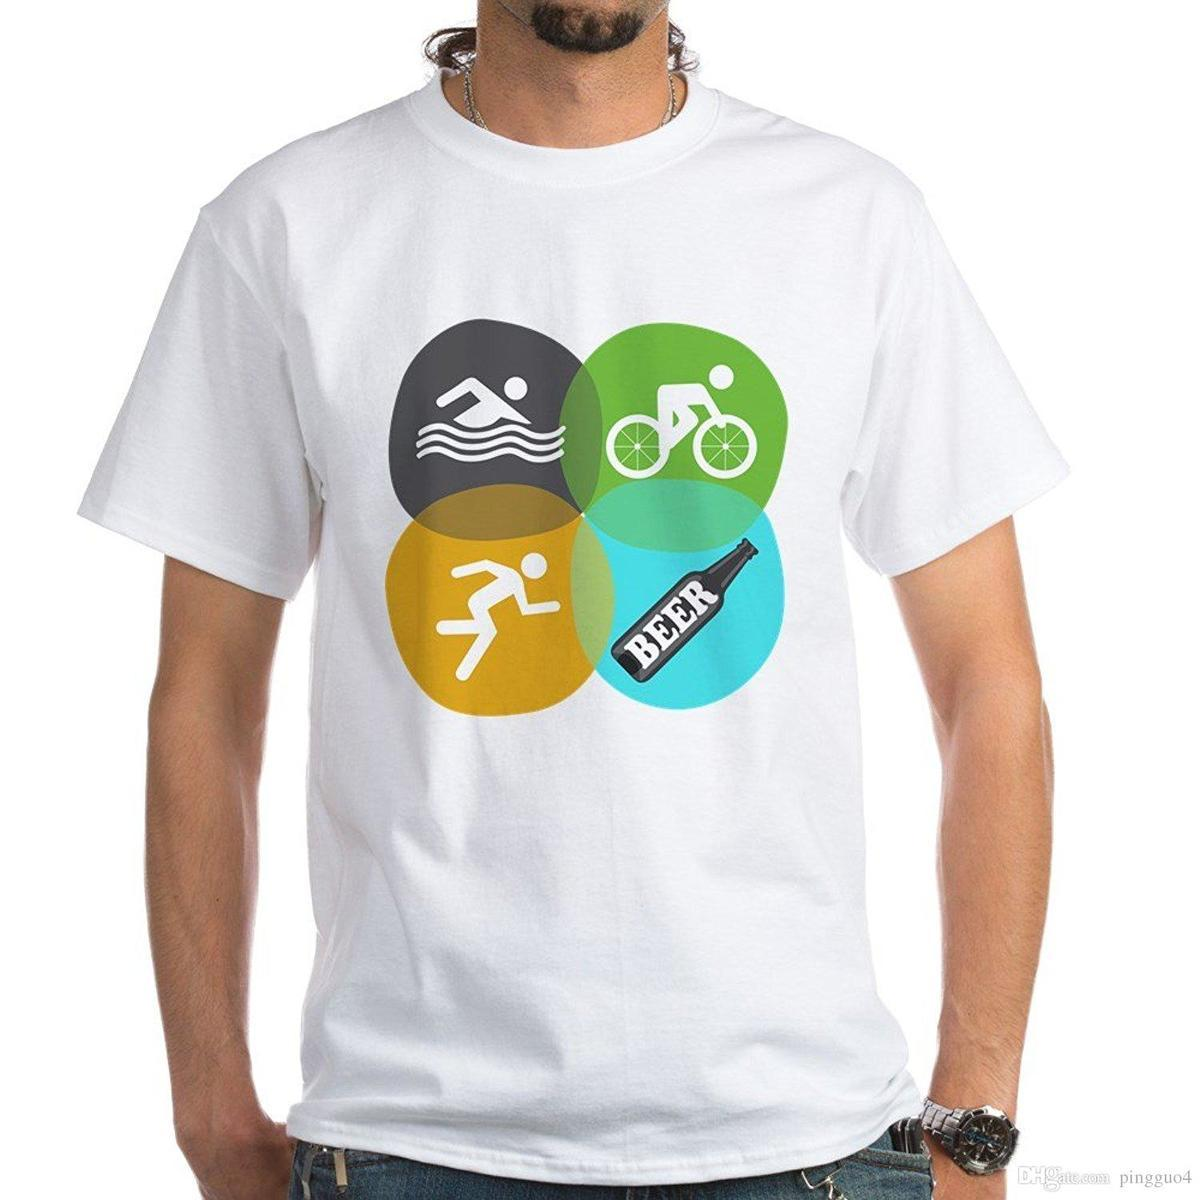 781c99d0 CafePress Swiming Bikes Runs Beer! 100% Cotton T Shirts, White T Shirt Men Funny  Tee Shirts Short Sleeve Pop Cotton Man Tee Go T Shirts Really Funny Shirts  ...